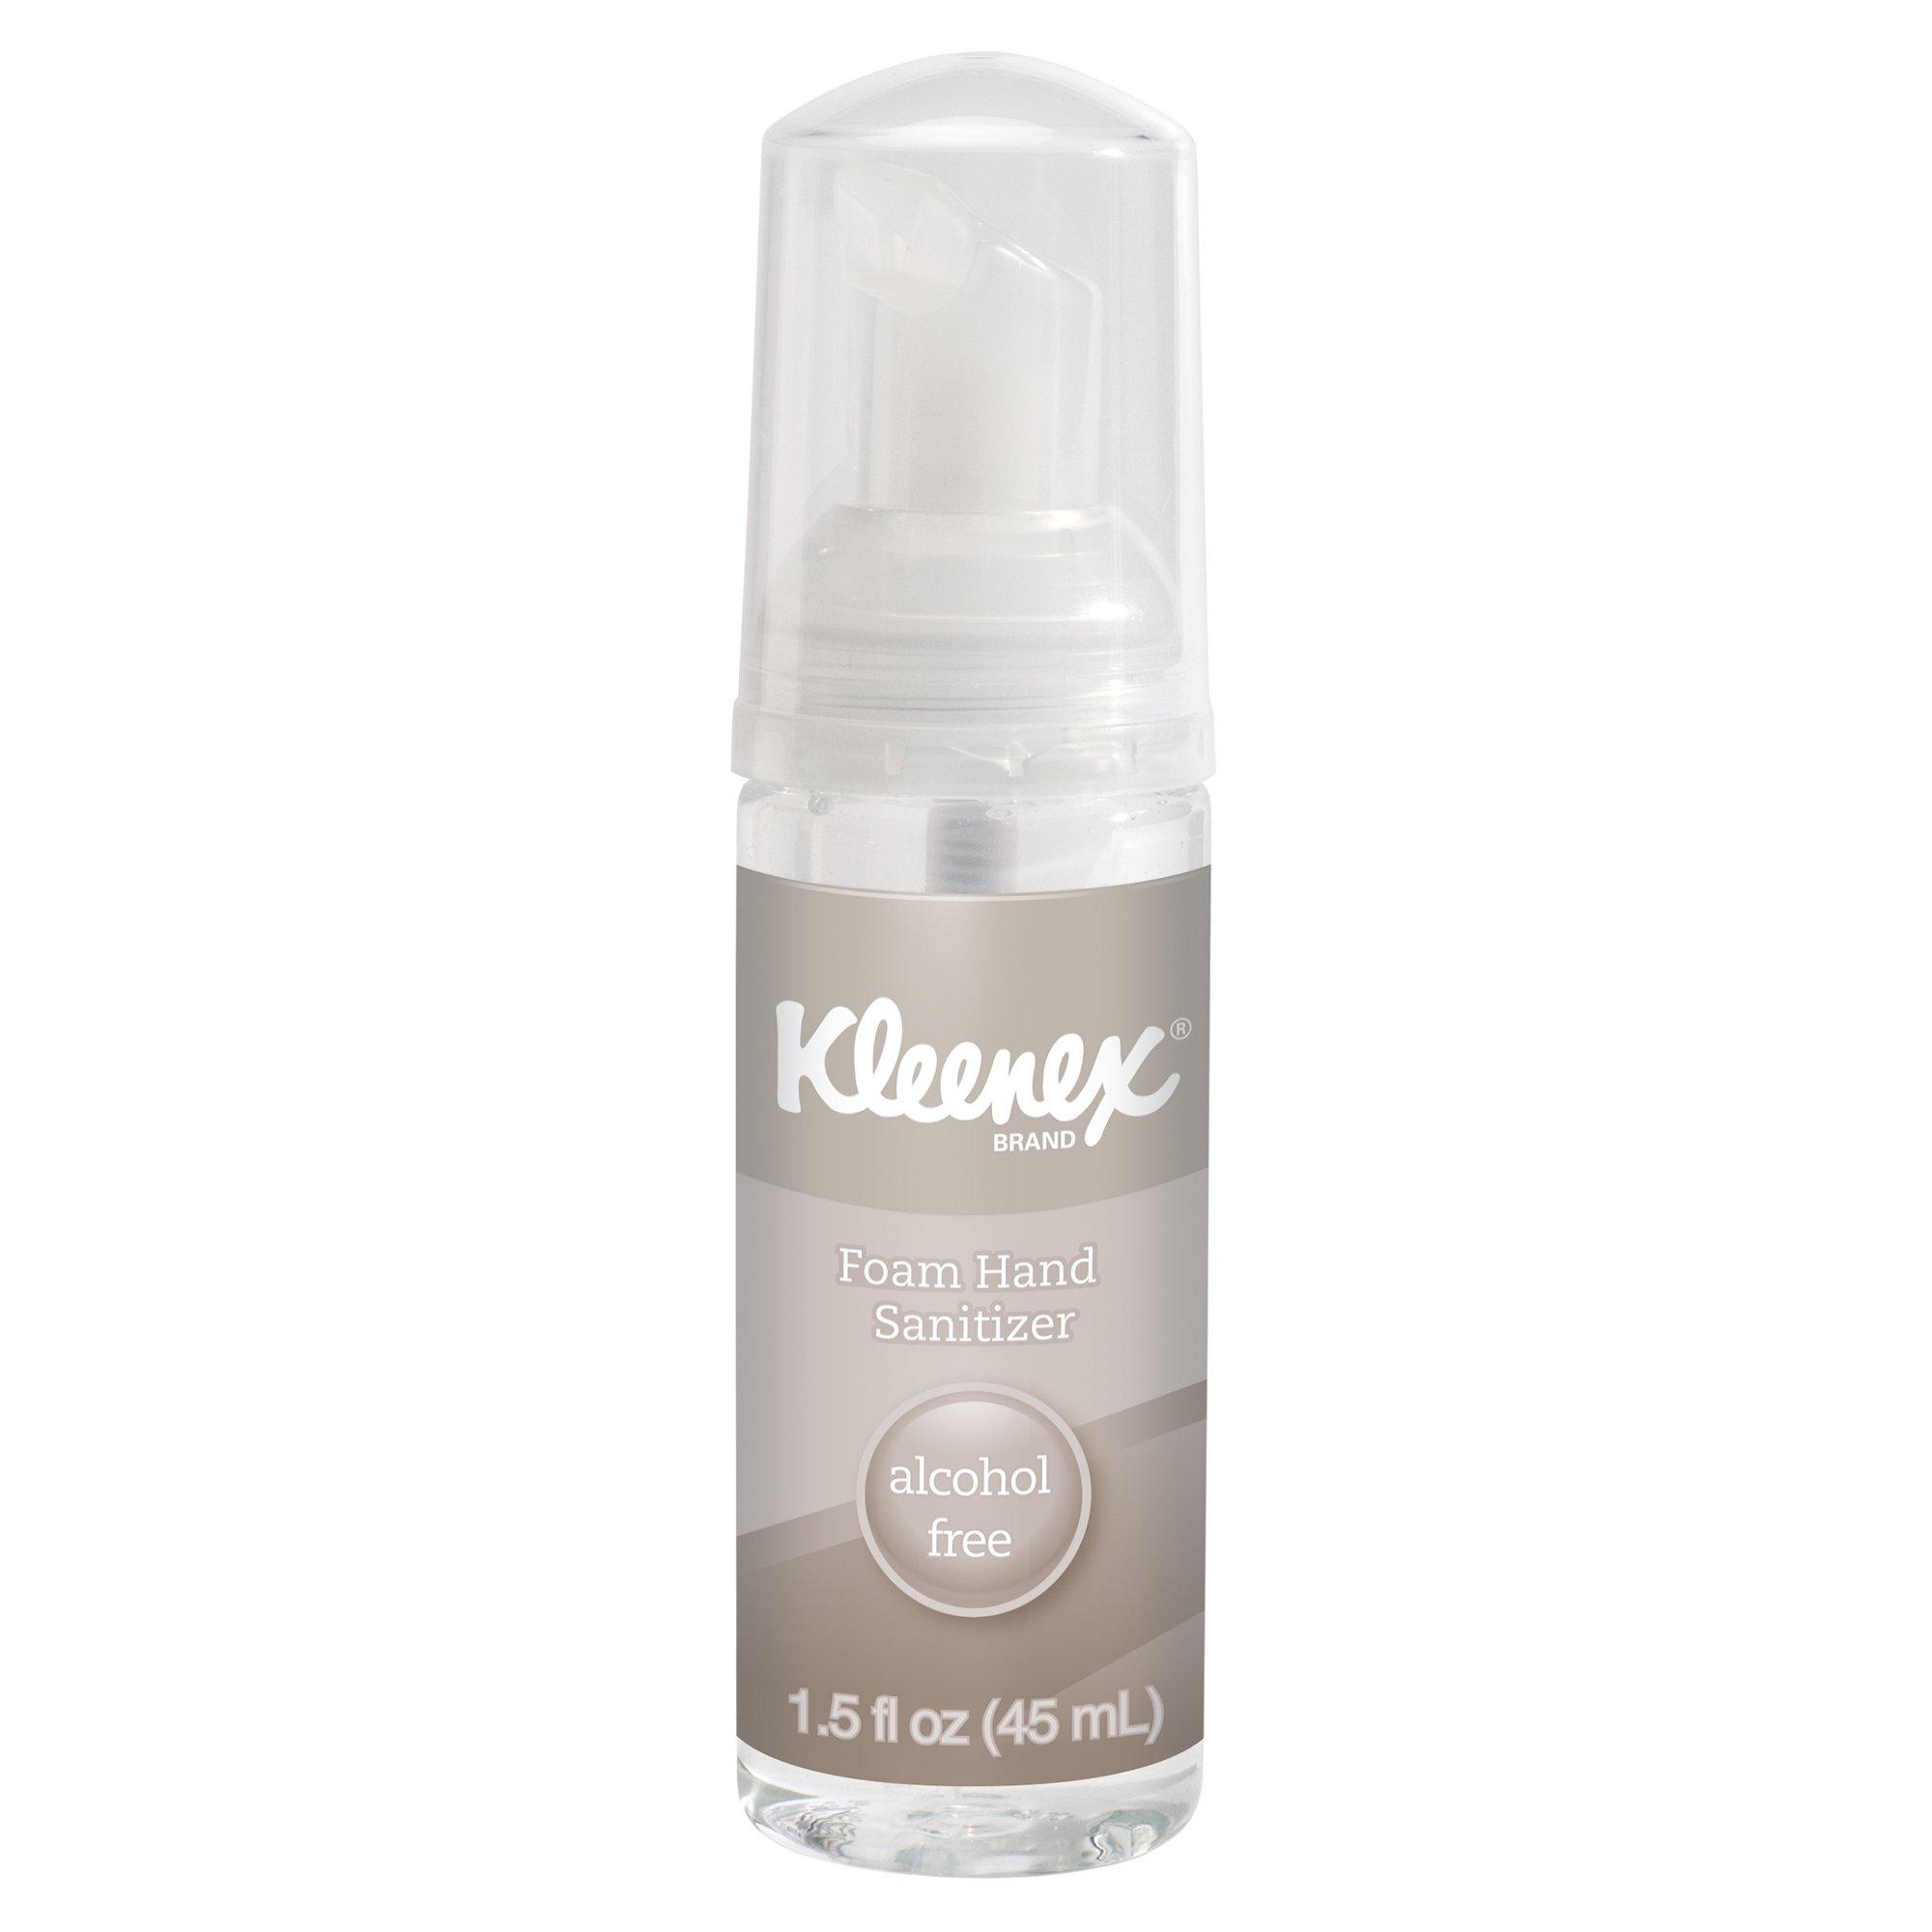 Kleenex Alcohol Free Foam Hand Sanitizer (34136), Clear, Unscented, 1.5 OZ. Pump Bottle, 12 Bottles / Case